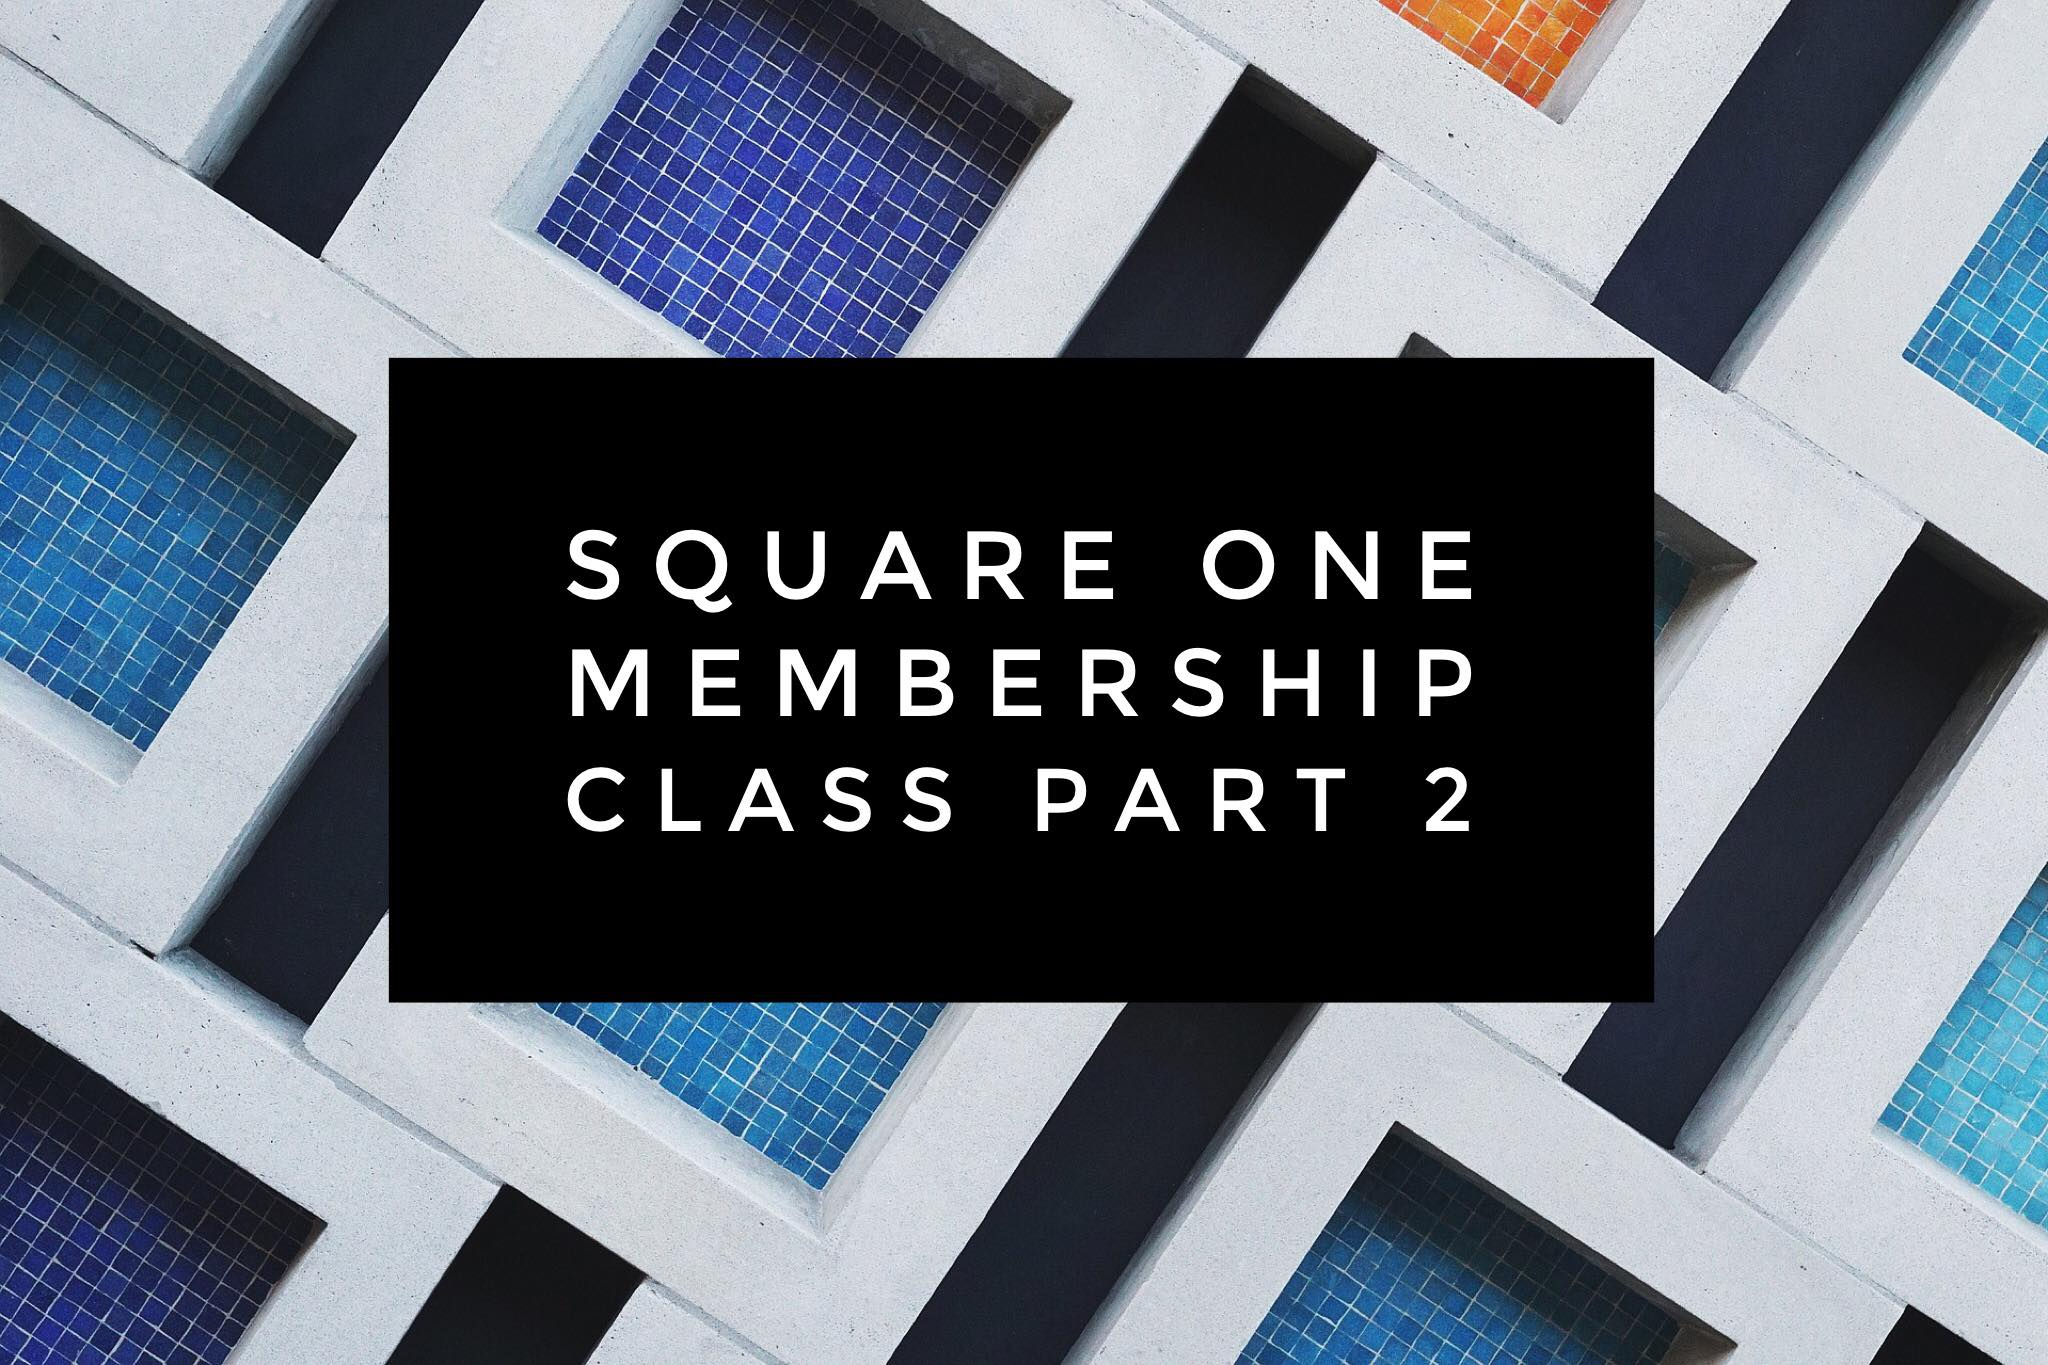 Square one pt 2